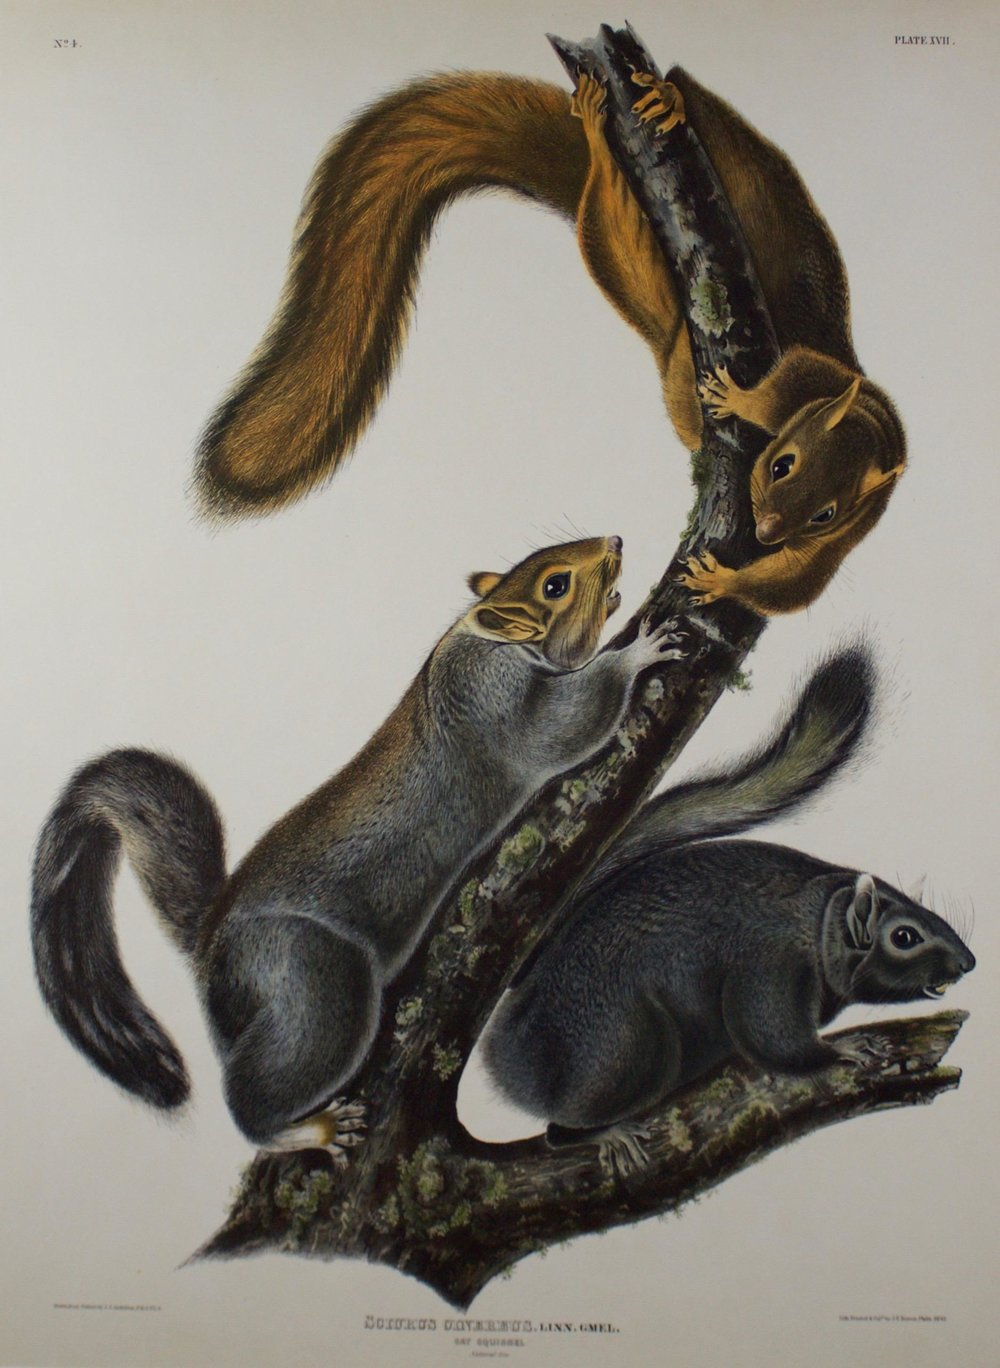 John James Audubon     Cat Squirrell - Sciurus Cinereus, Linn Gmel.   Plate 17 - Plate XVII  Lith Printed & Coll. J.T. Bowen, Phila., 1843  CJO0002